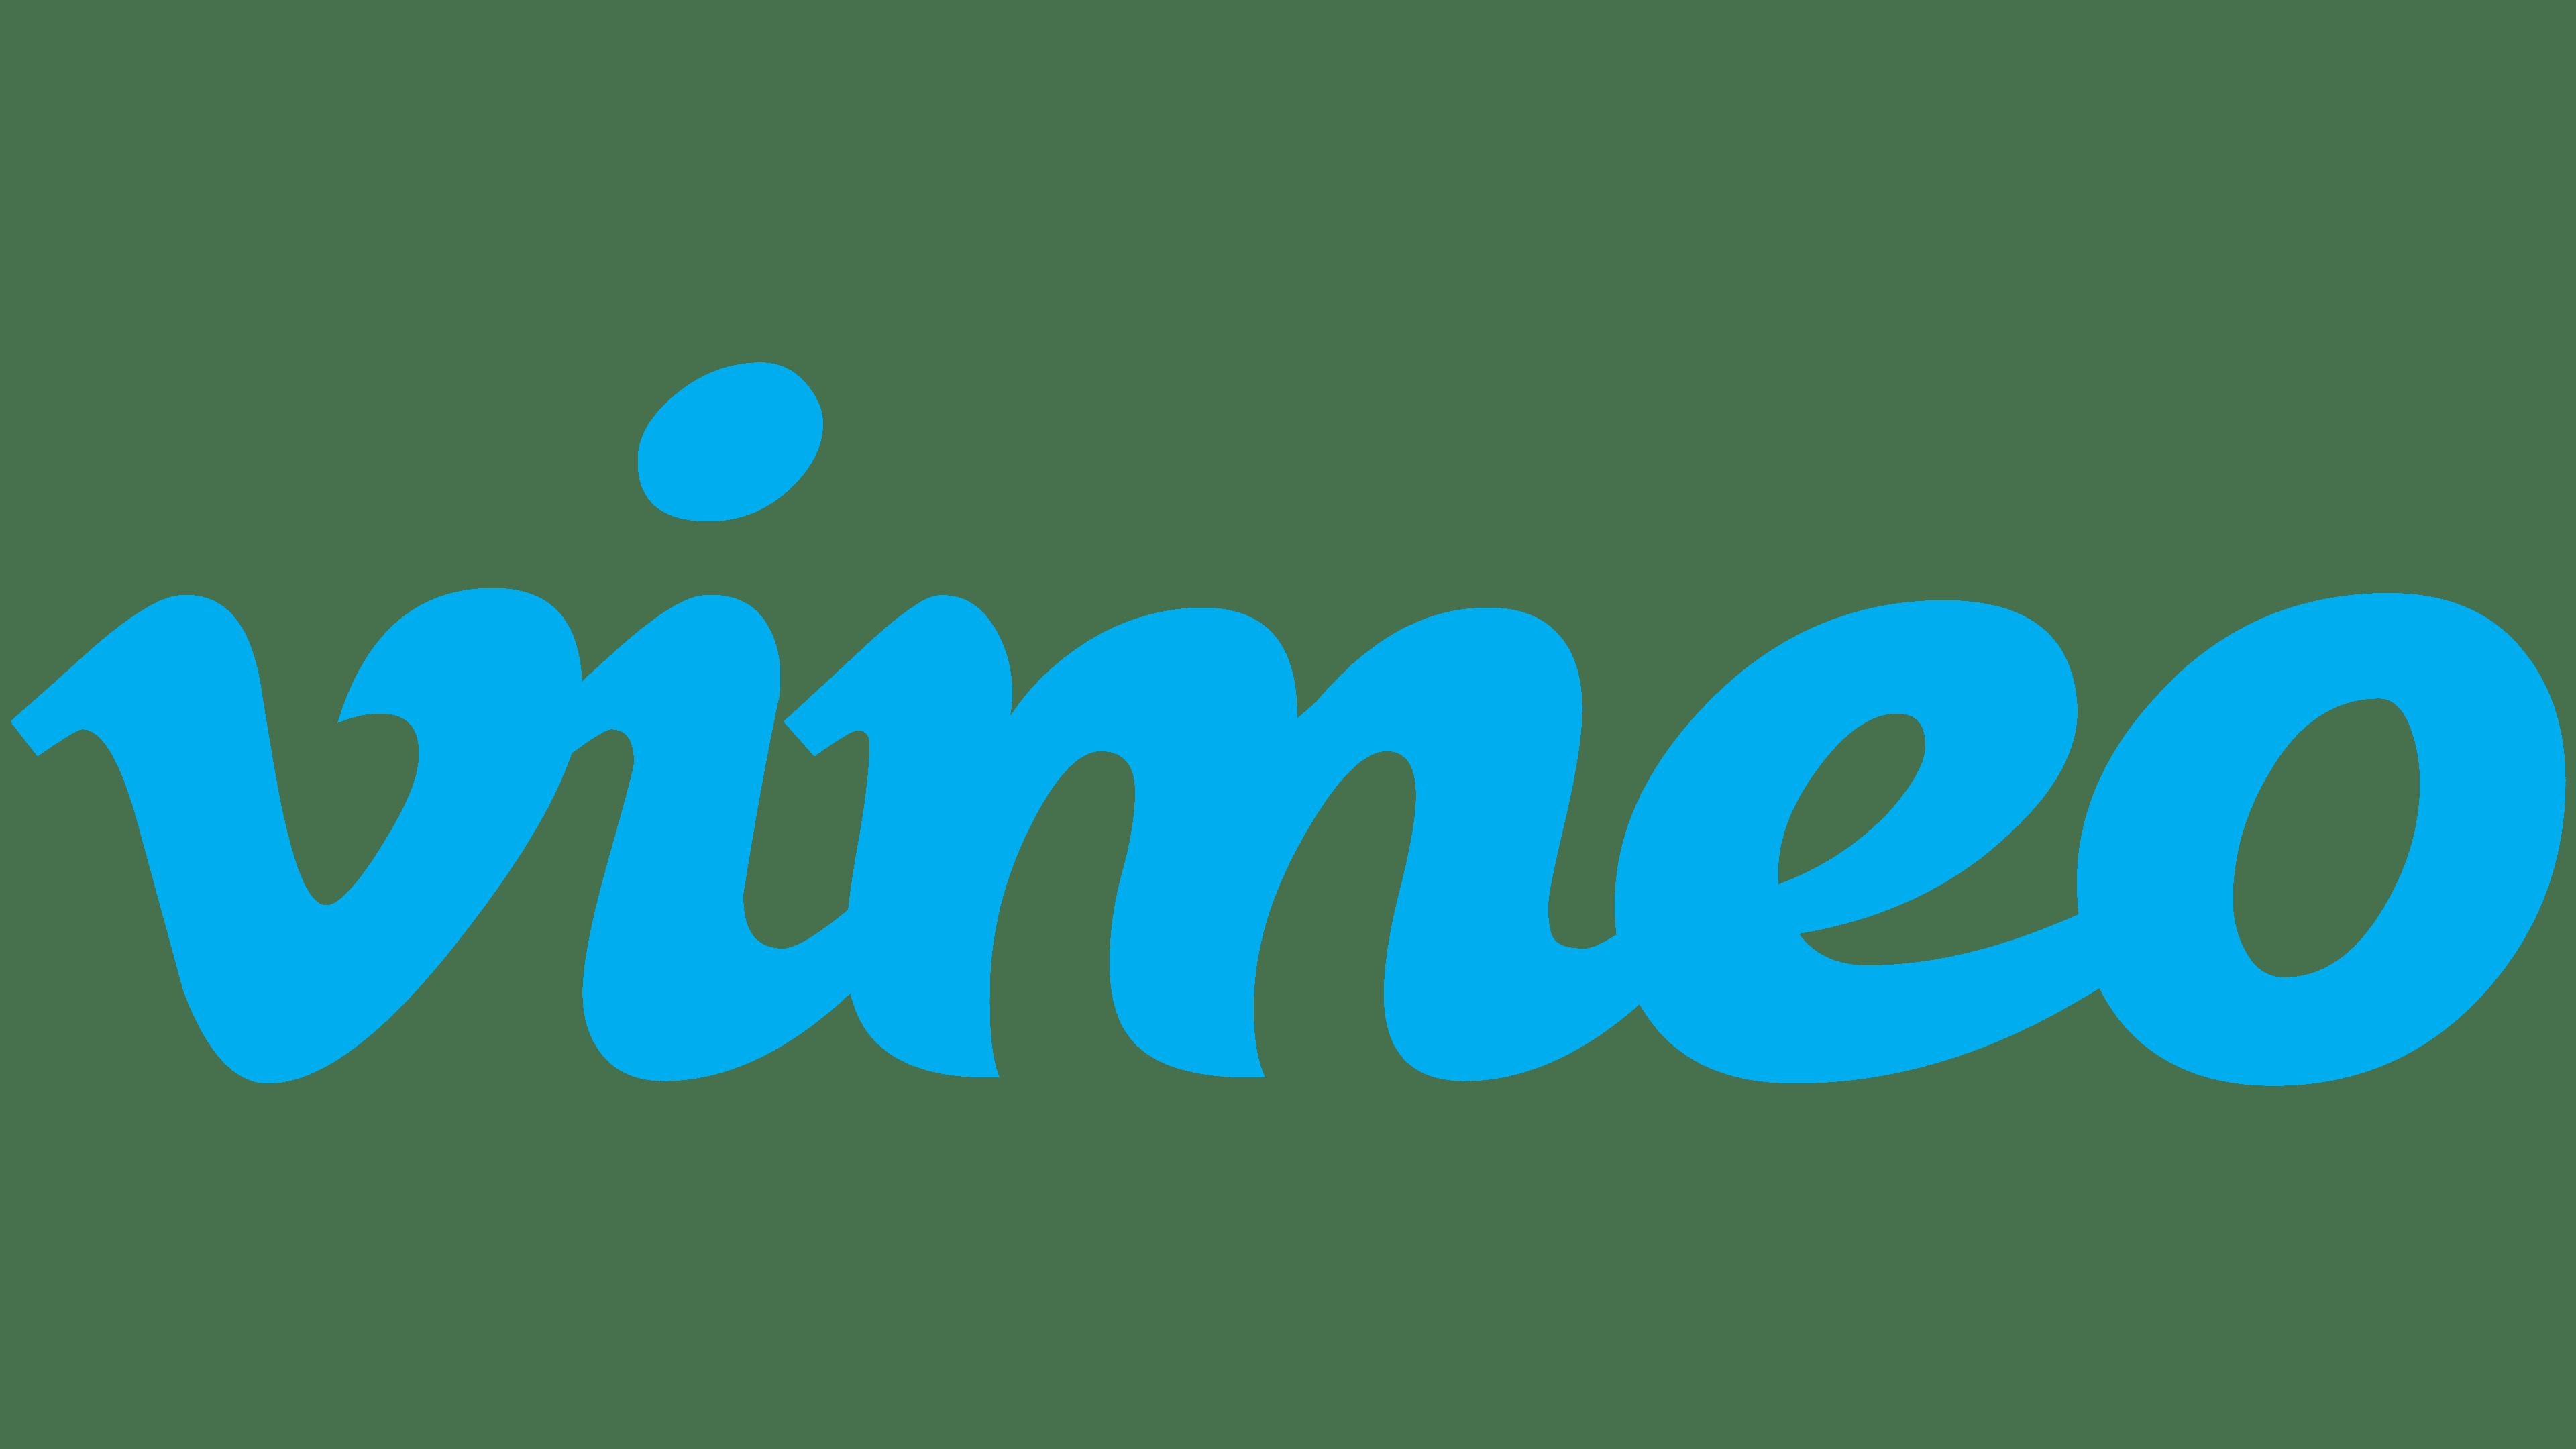 vimeo logo